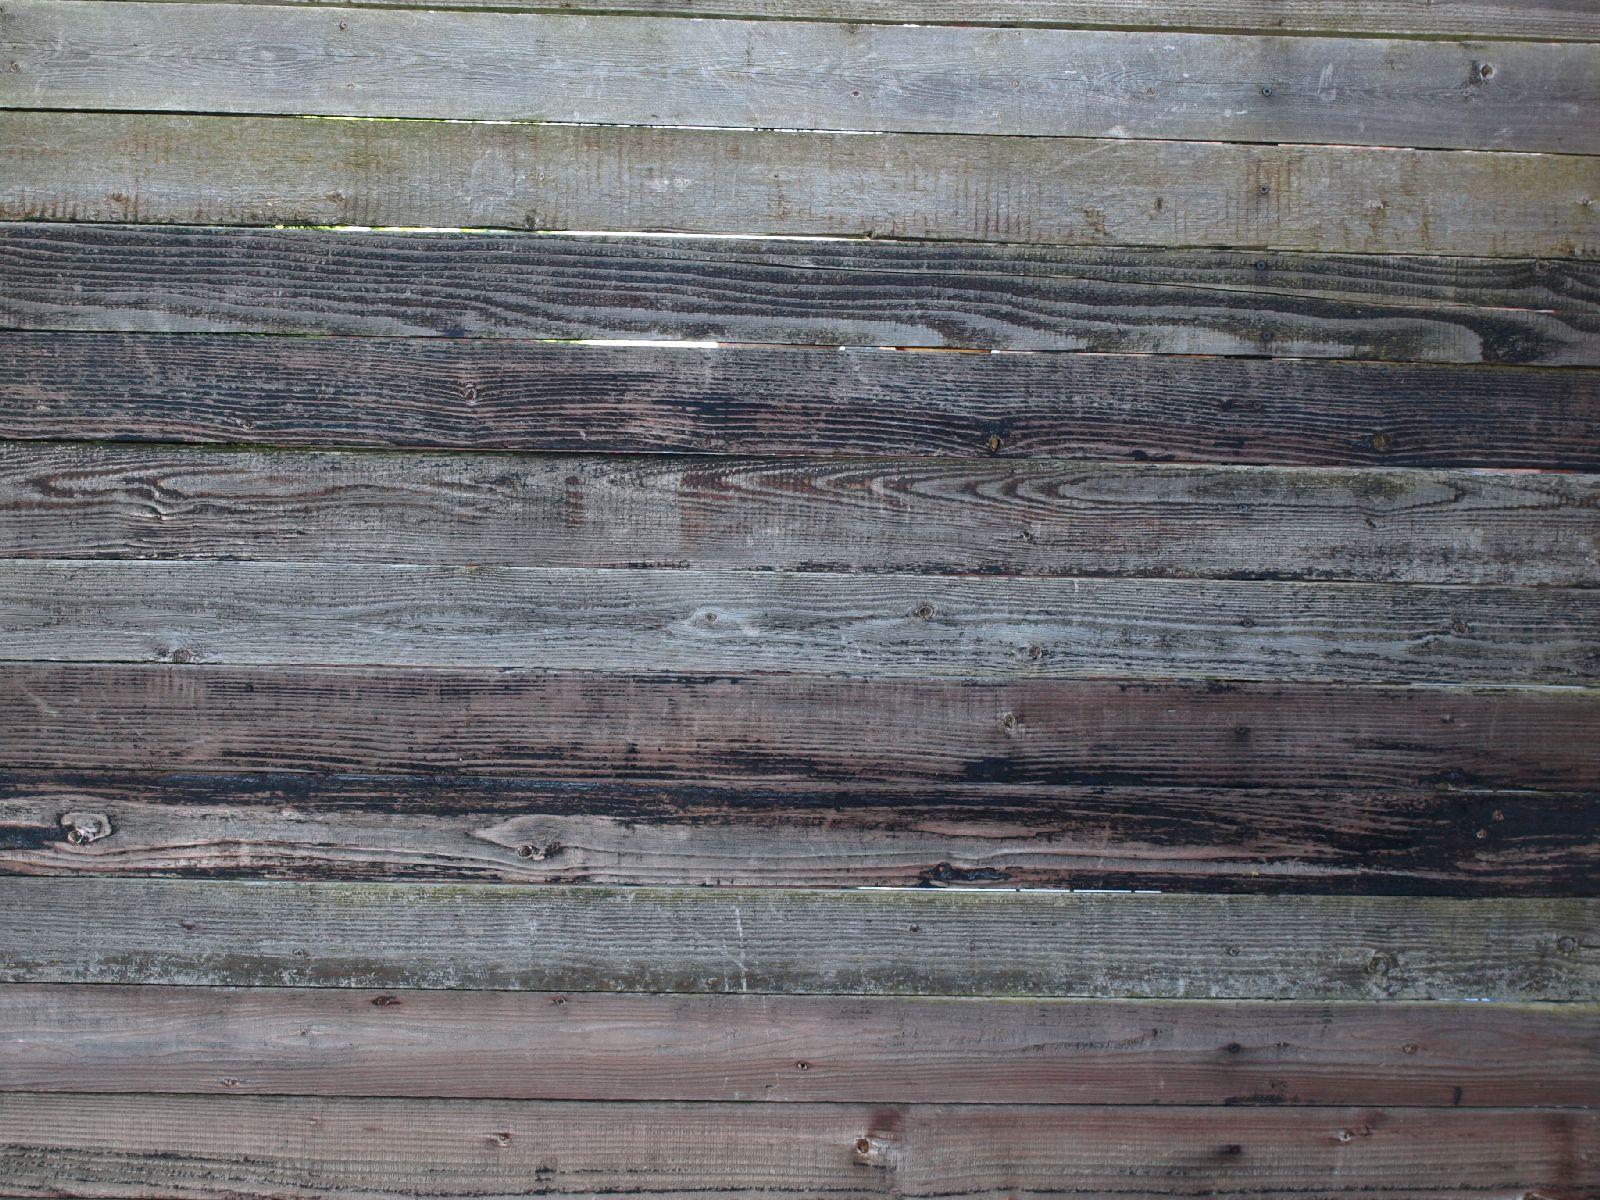 Wood_Texture_A_P6143379